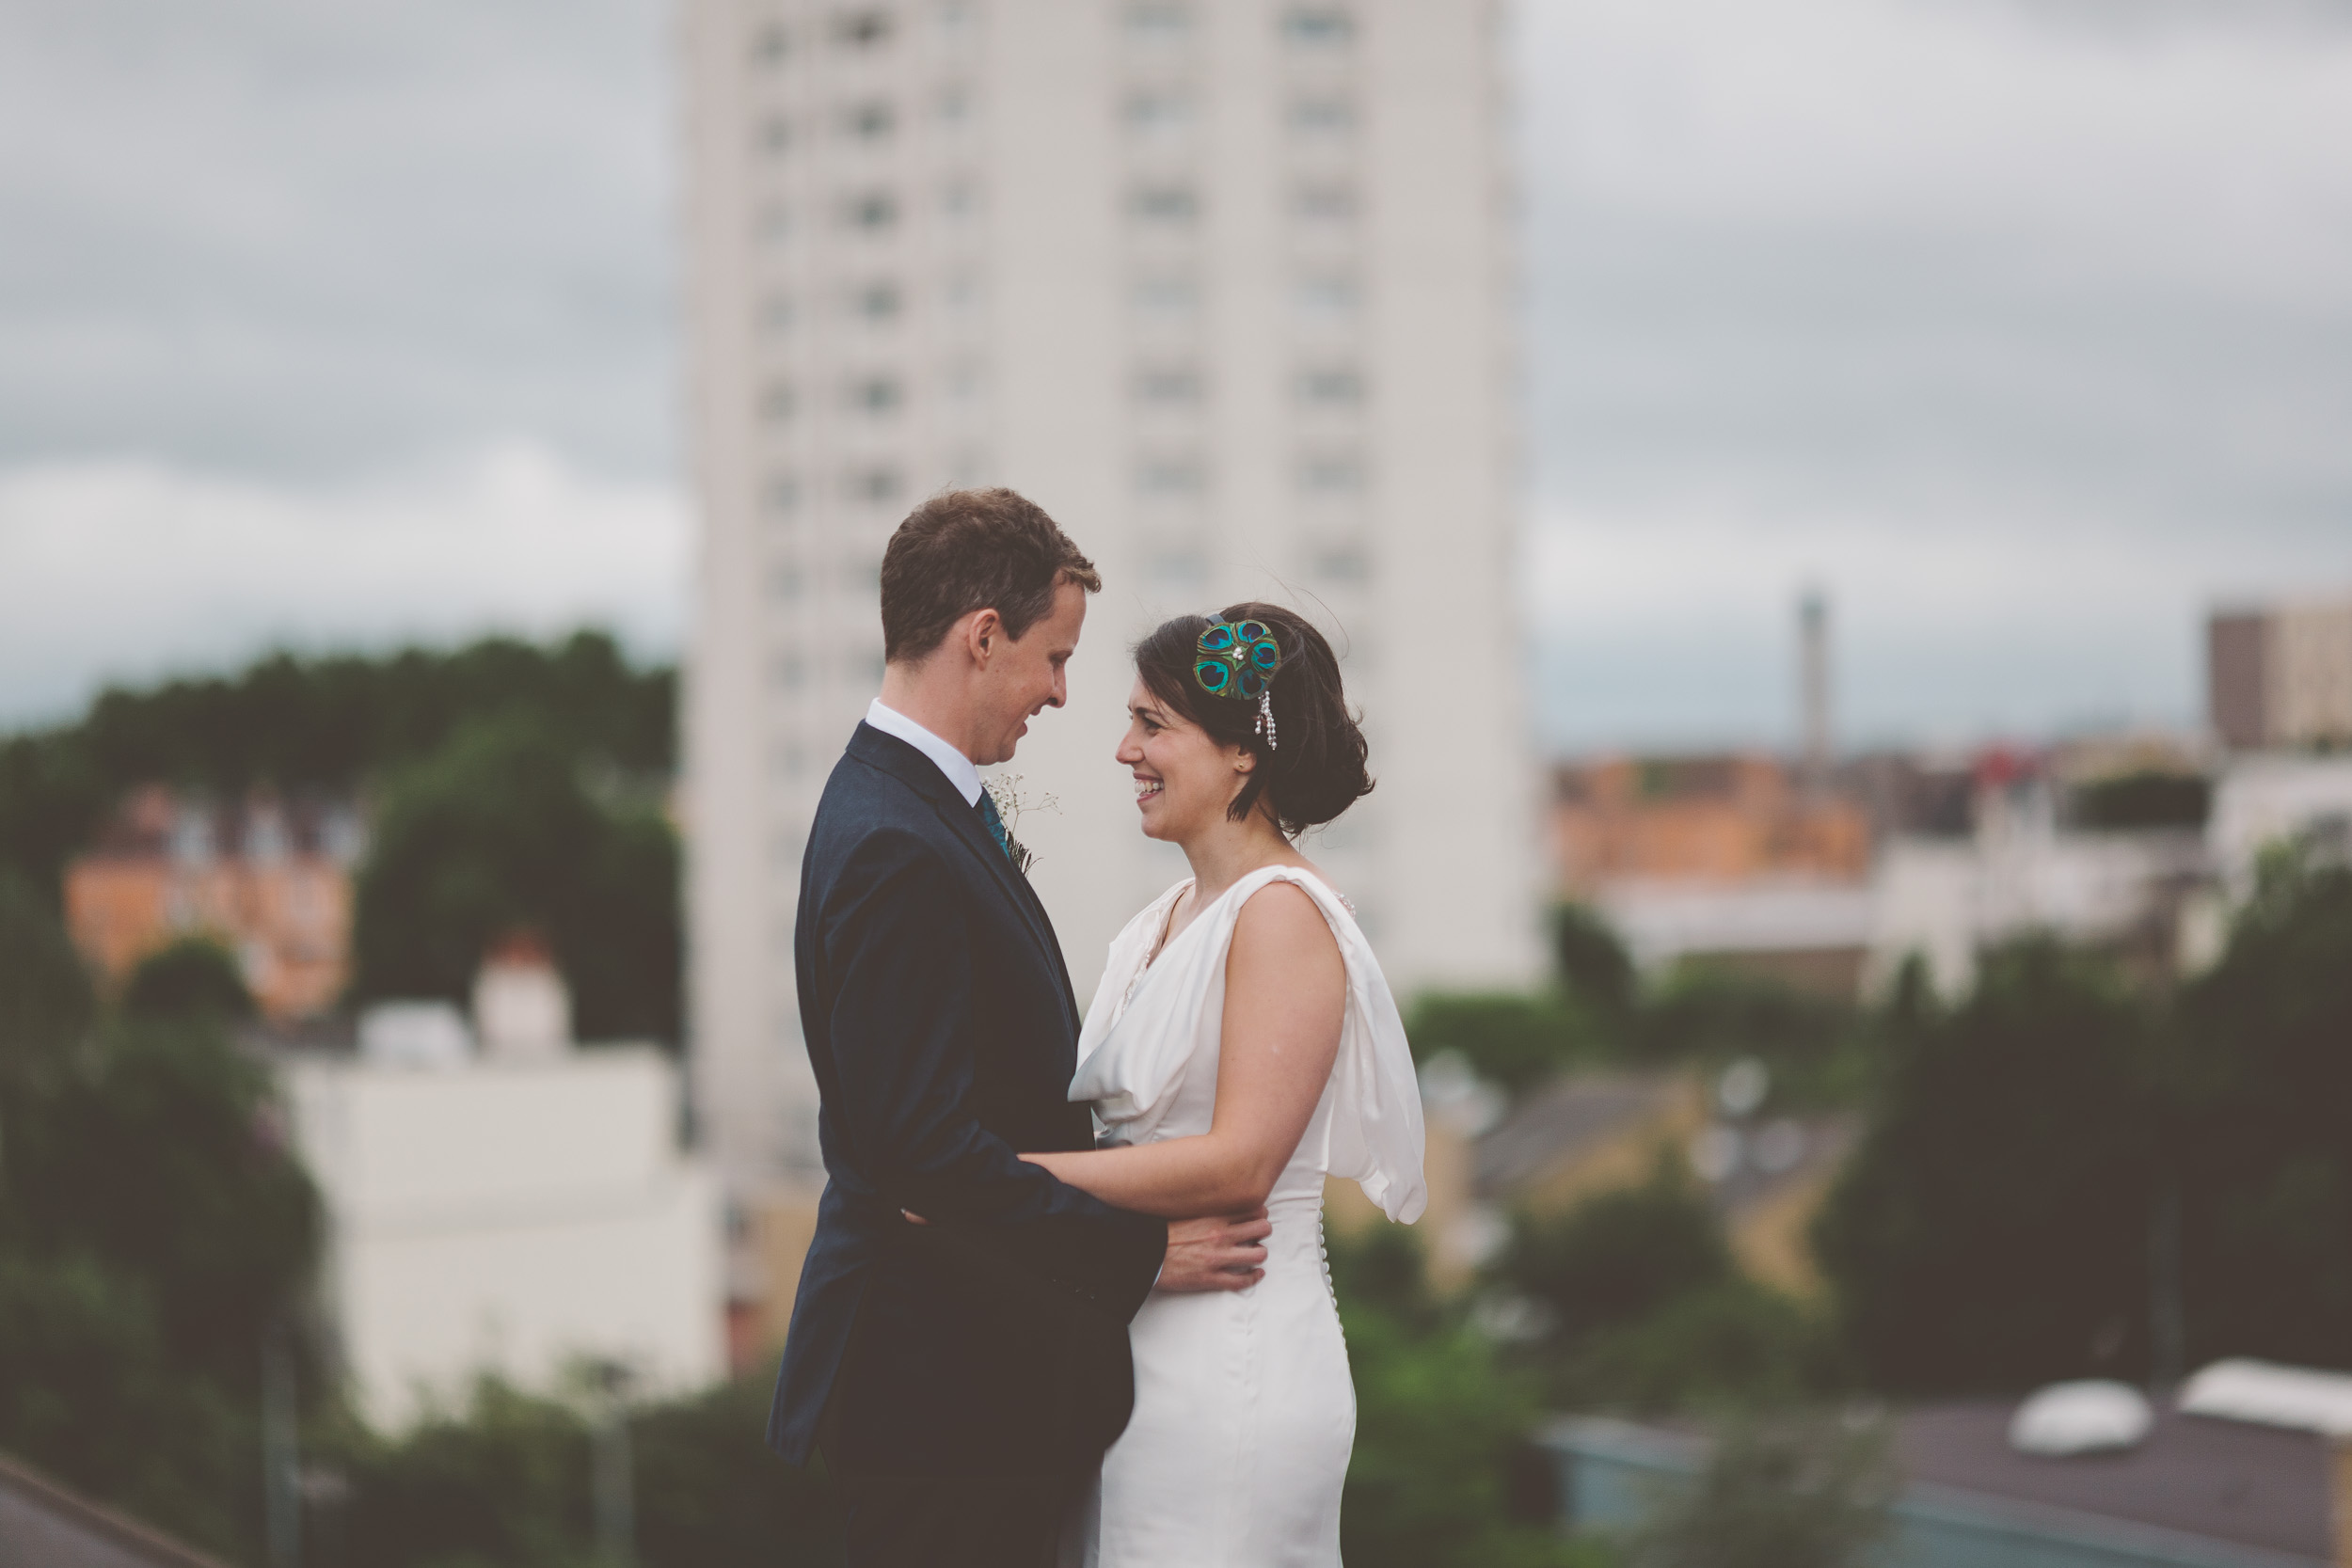 islington-town-hall-4th-floor-studios-wedding280.jpg